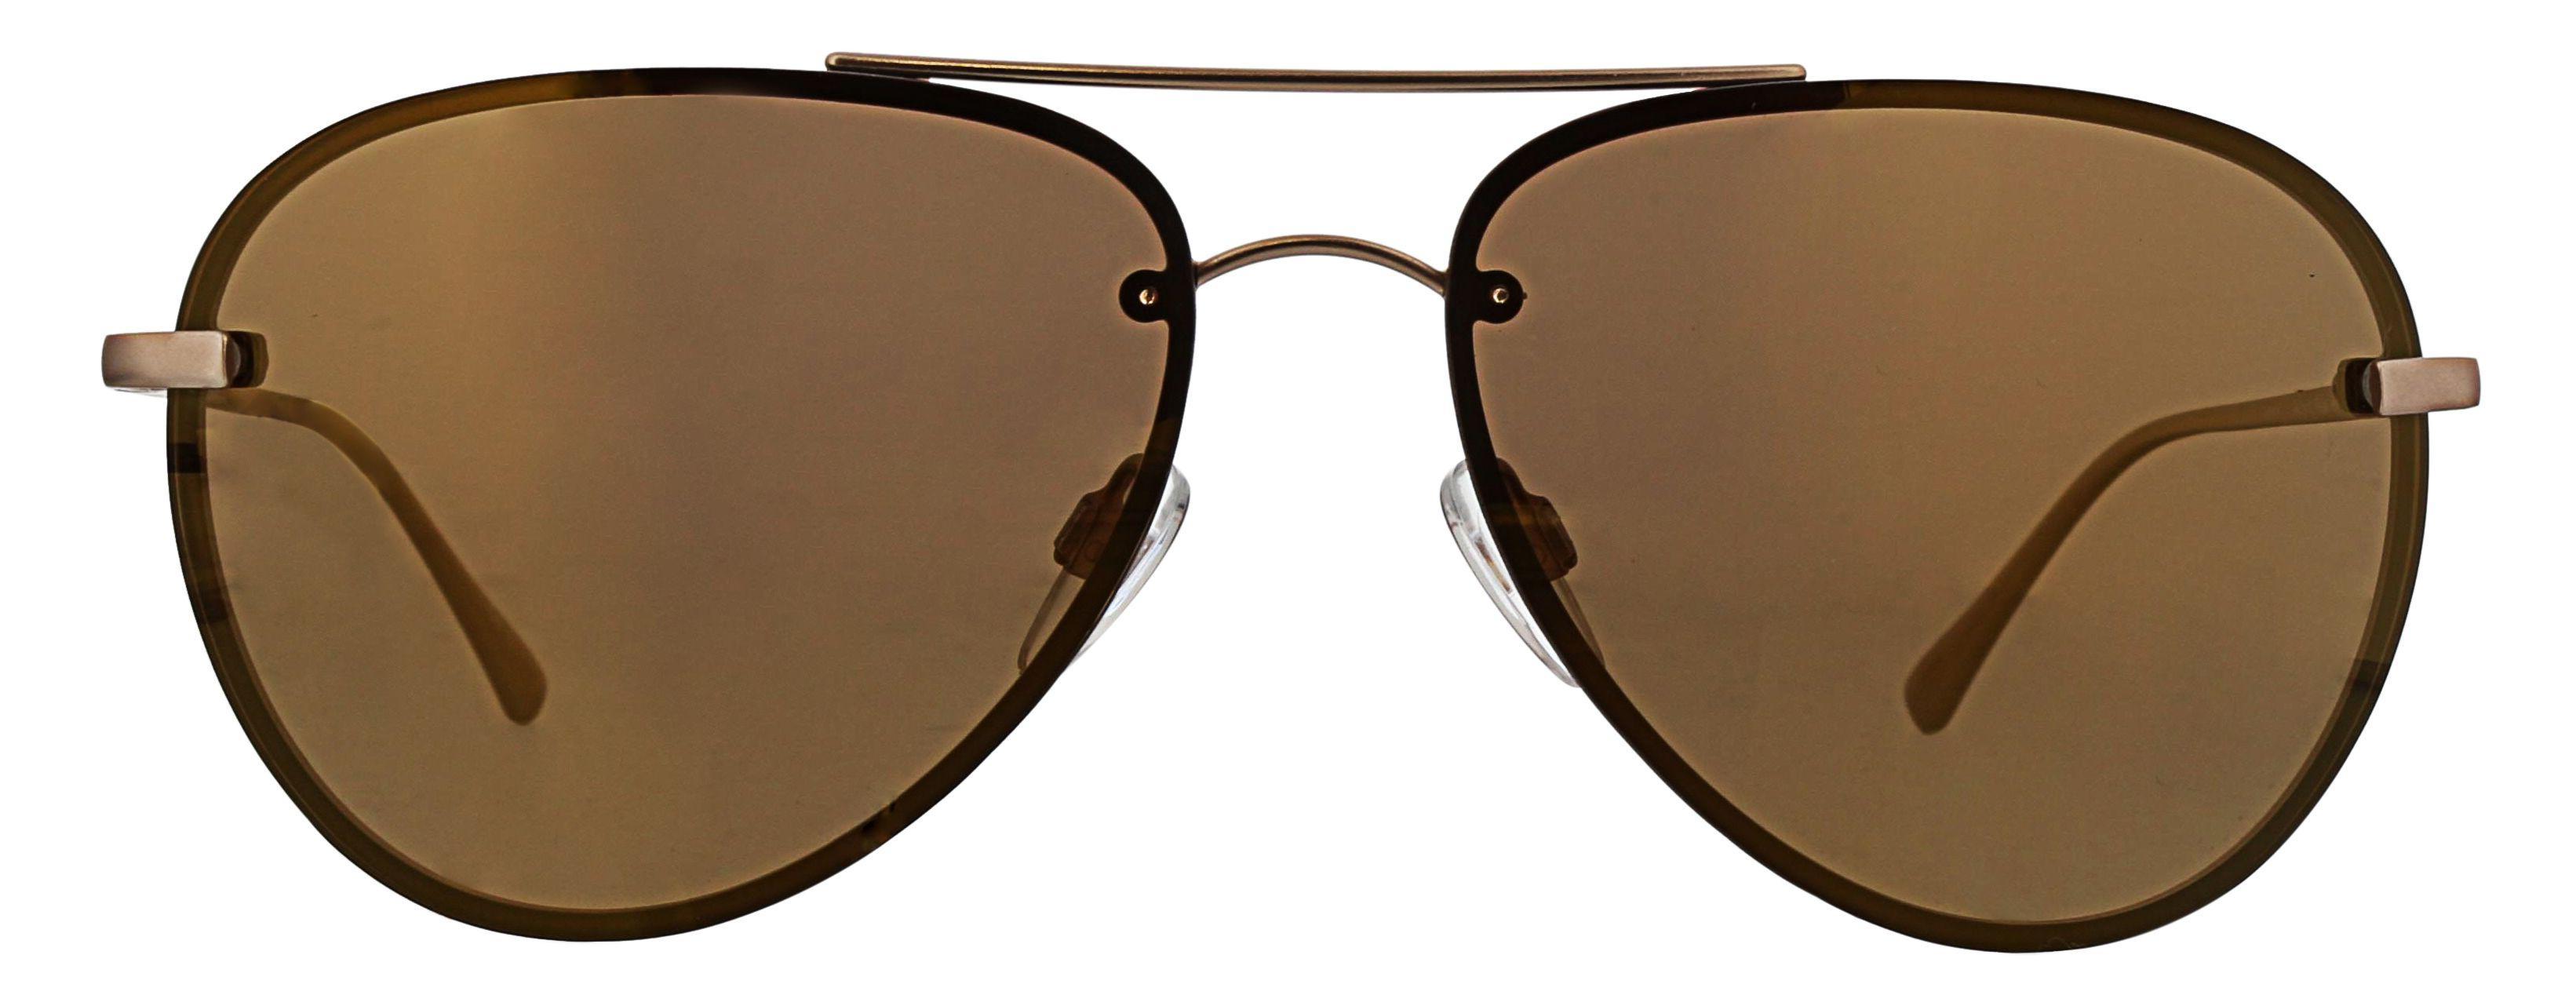 7990b698fa Vera Bradley. Women s Deanna Polarized Aviator Sunglasses